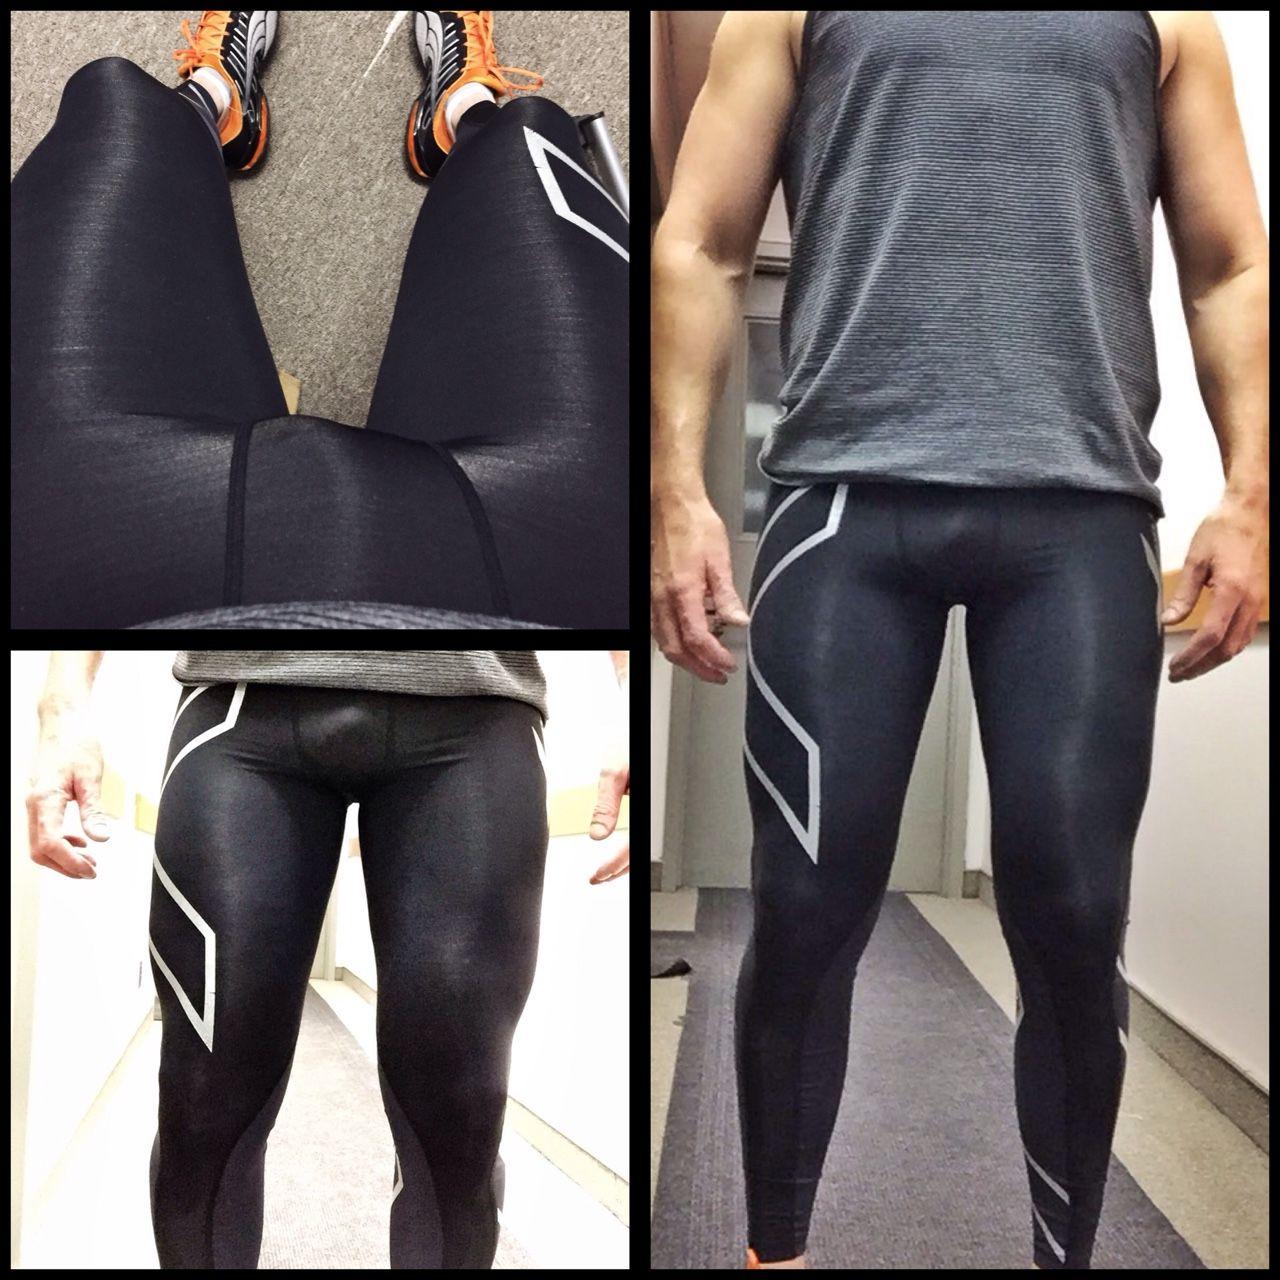 Lycra Spandex Men Mens Athletic Stuff Pinterest Premium Base Layer Manset Sports Compression Adidas Nike Under Armour Tights Leggings How To Wear Sport Man